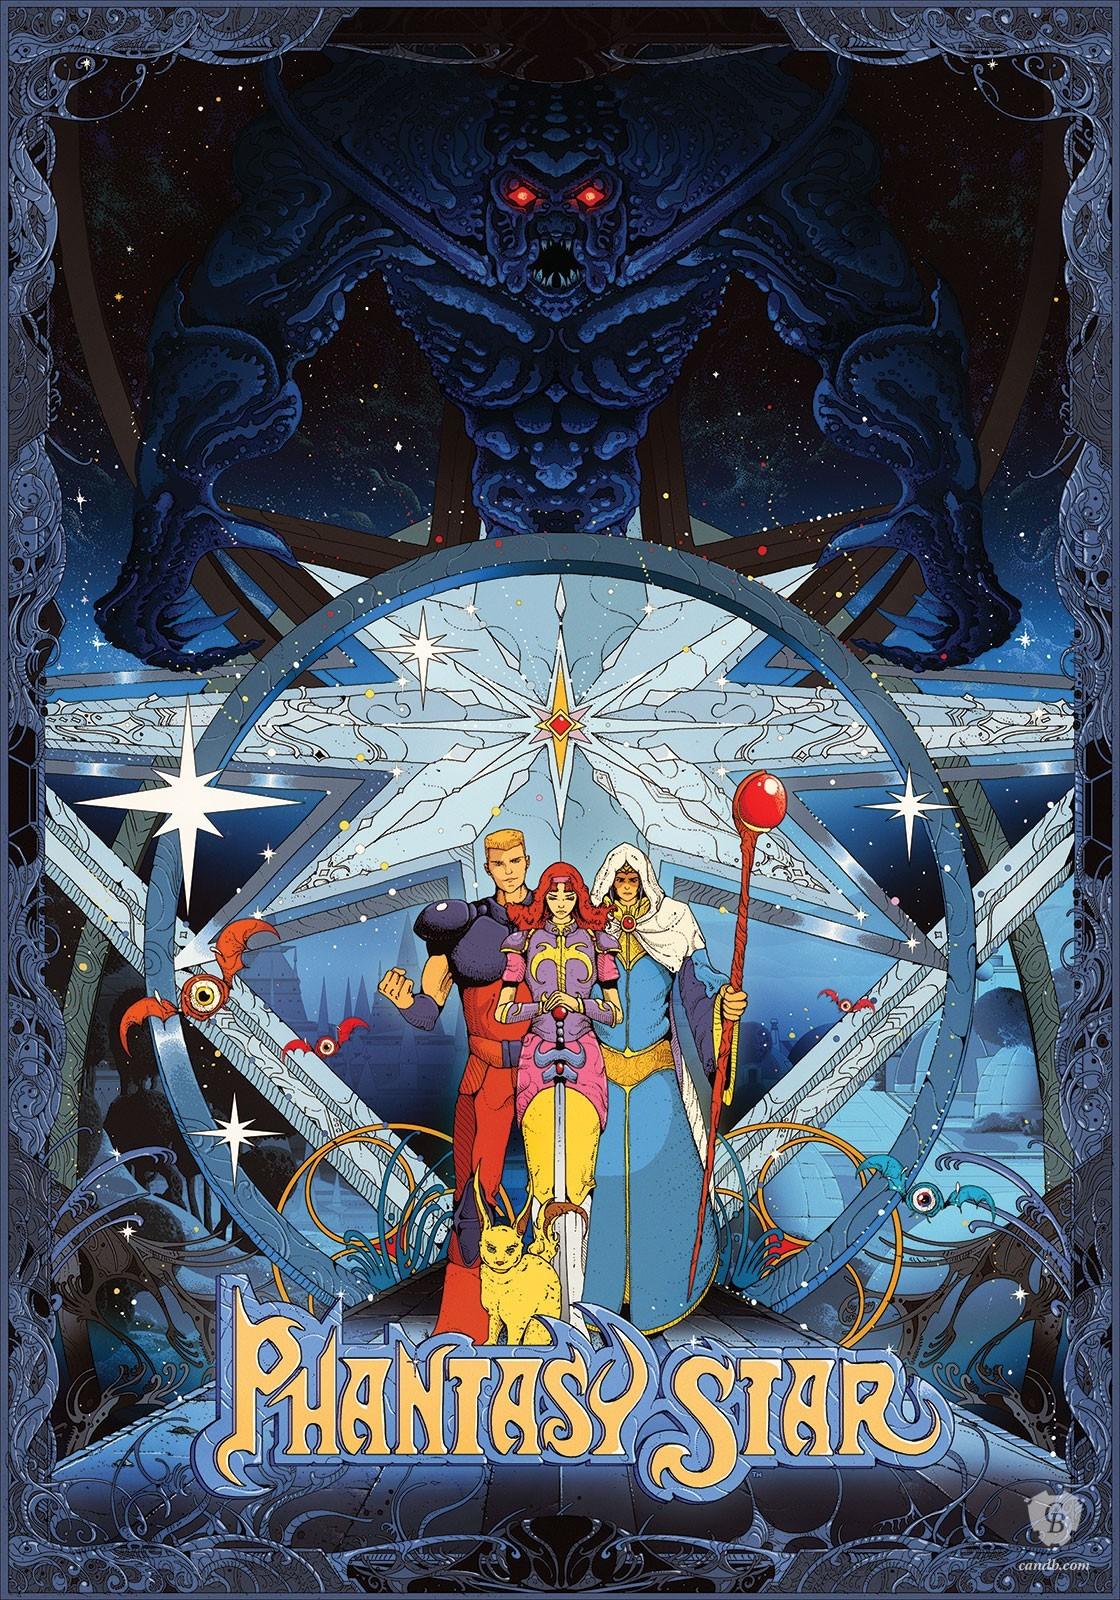 High Resolution Wallpaper | Phantasy Star 1120x1600 px